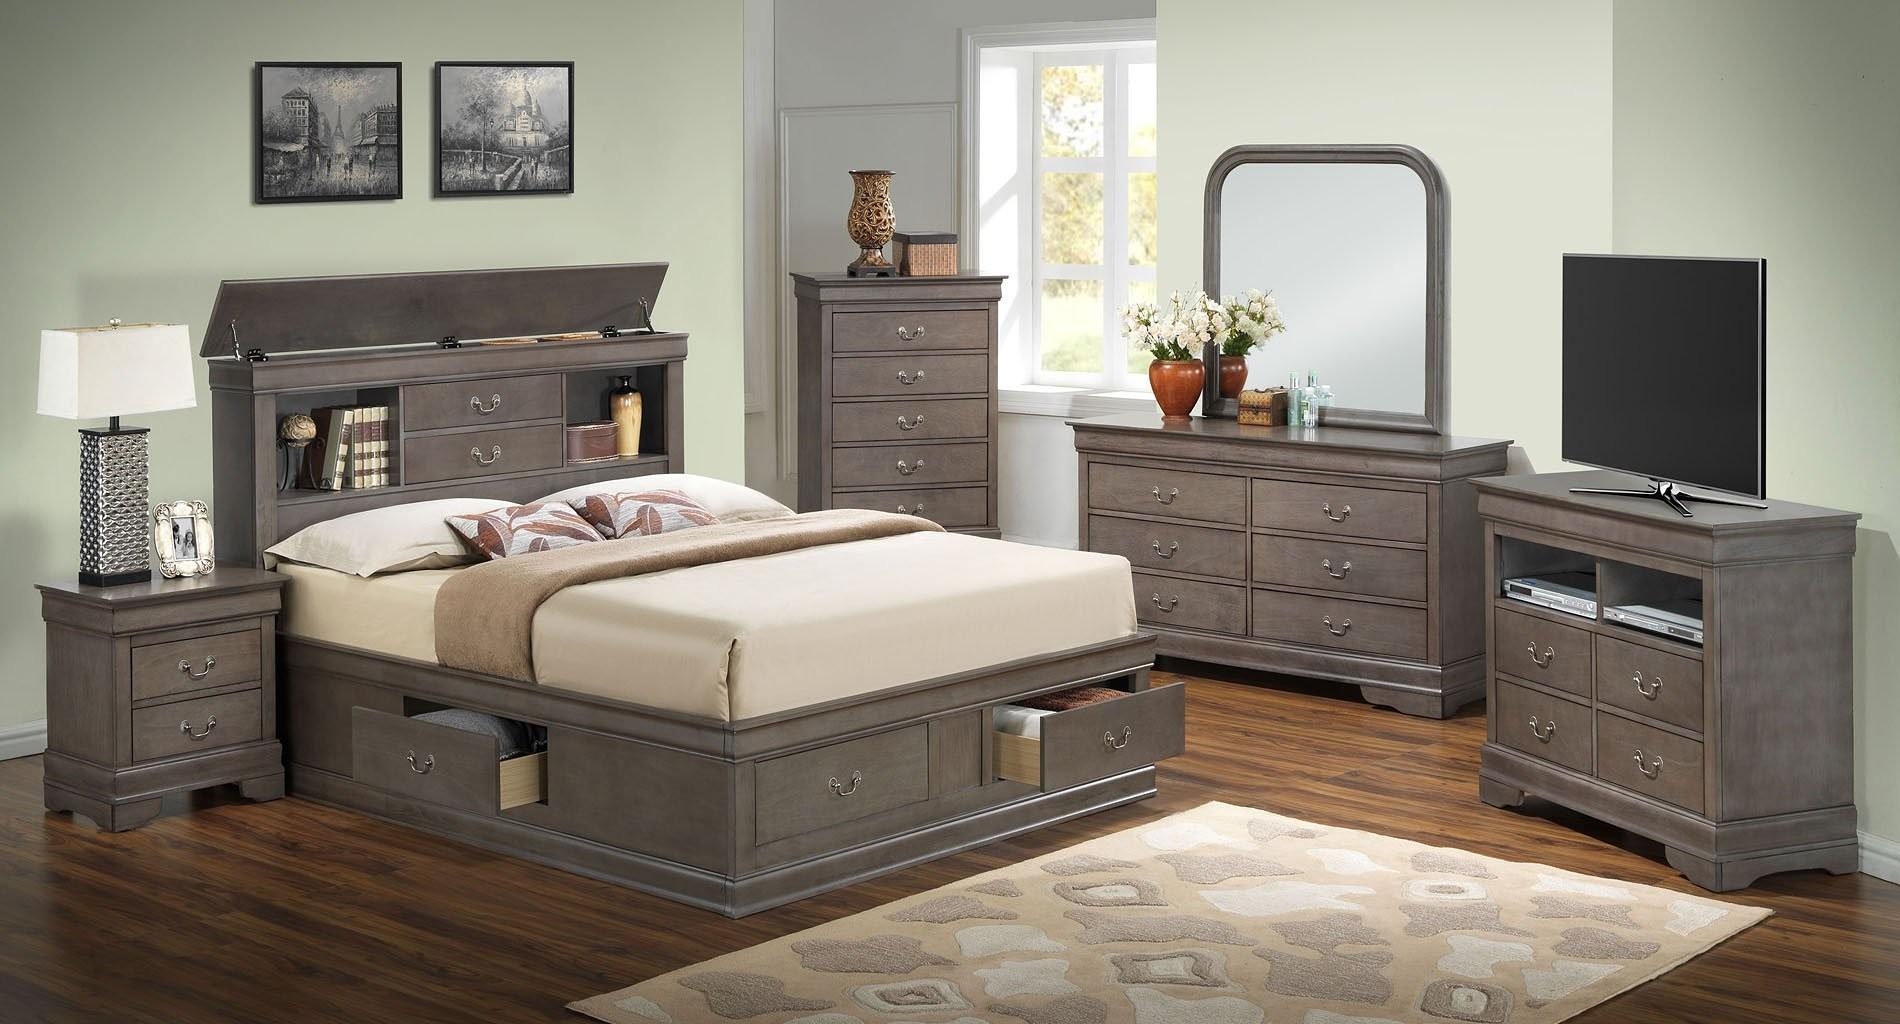 G3105 Bookcase Storage Bedroom Set 1stopbedrooms